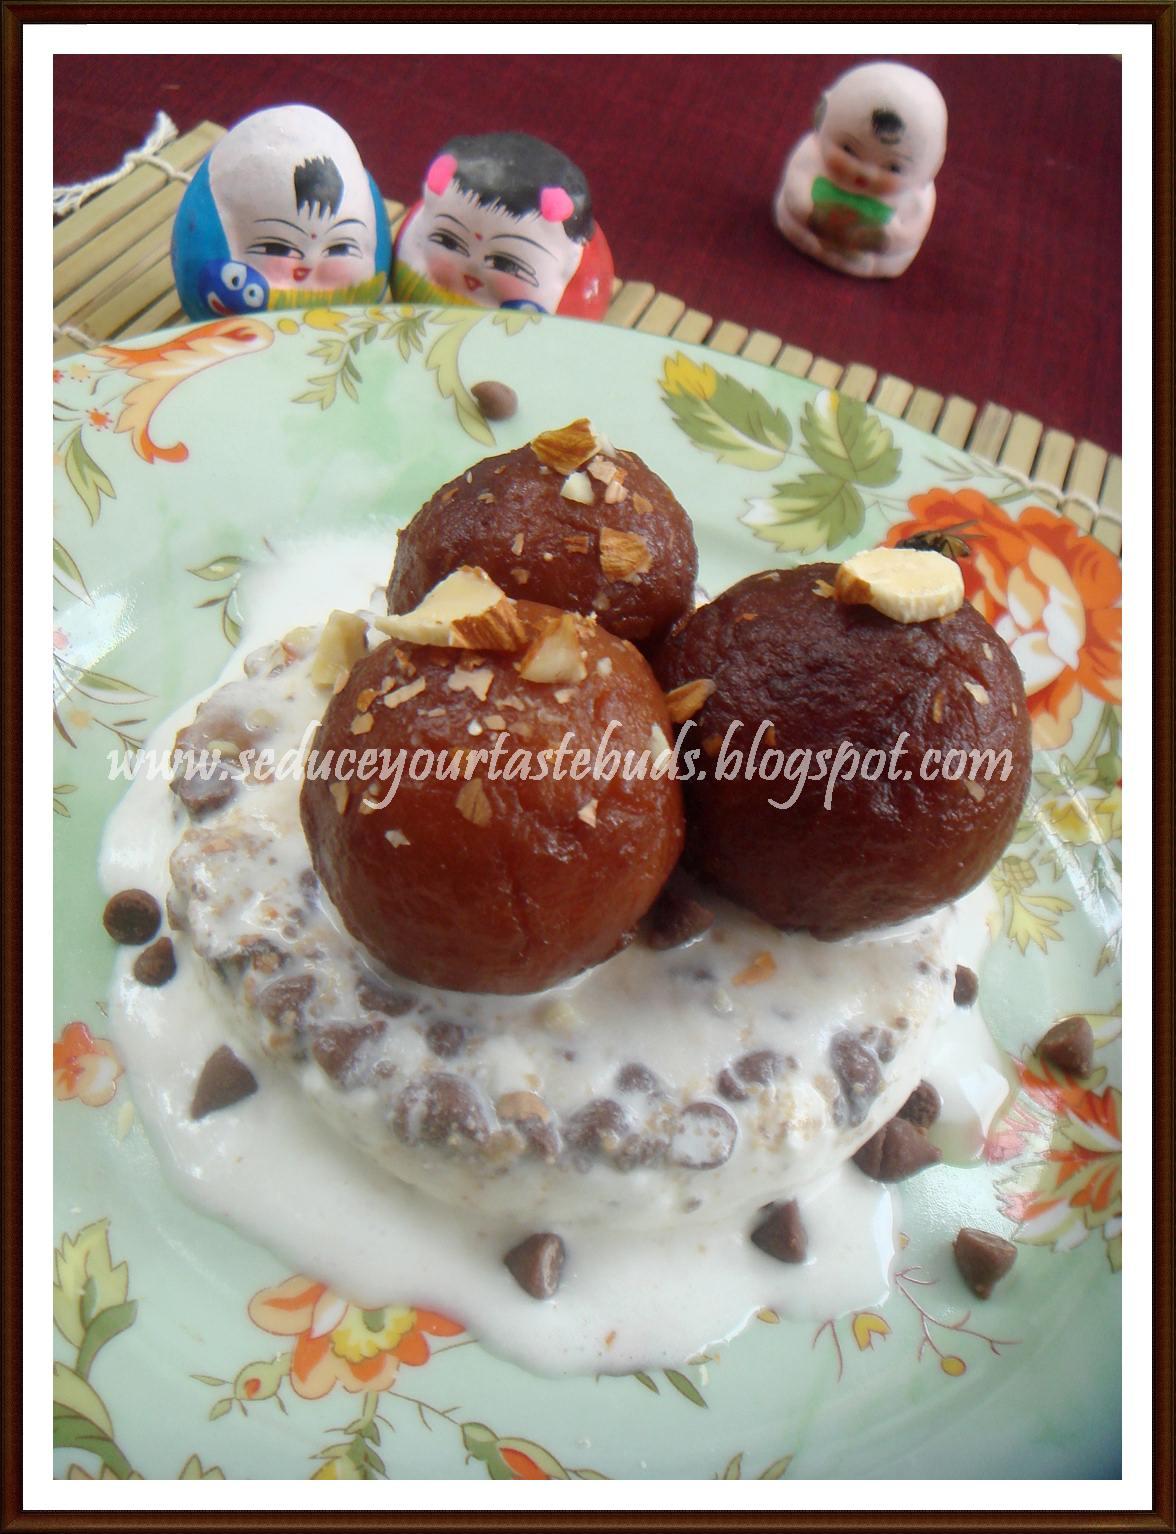 Seduce Your Tastebuds...: Chocolate Jamuns and Choco- Vanilla Ice ...